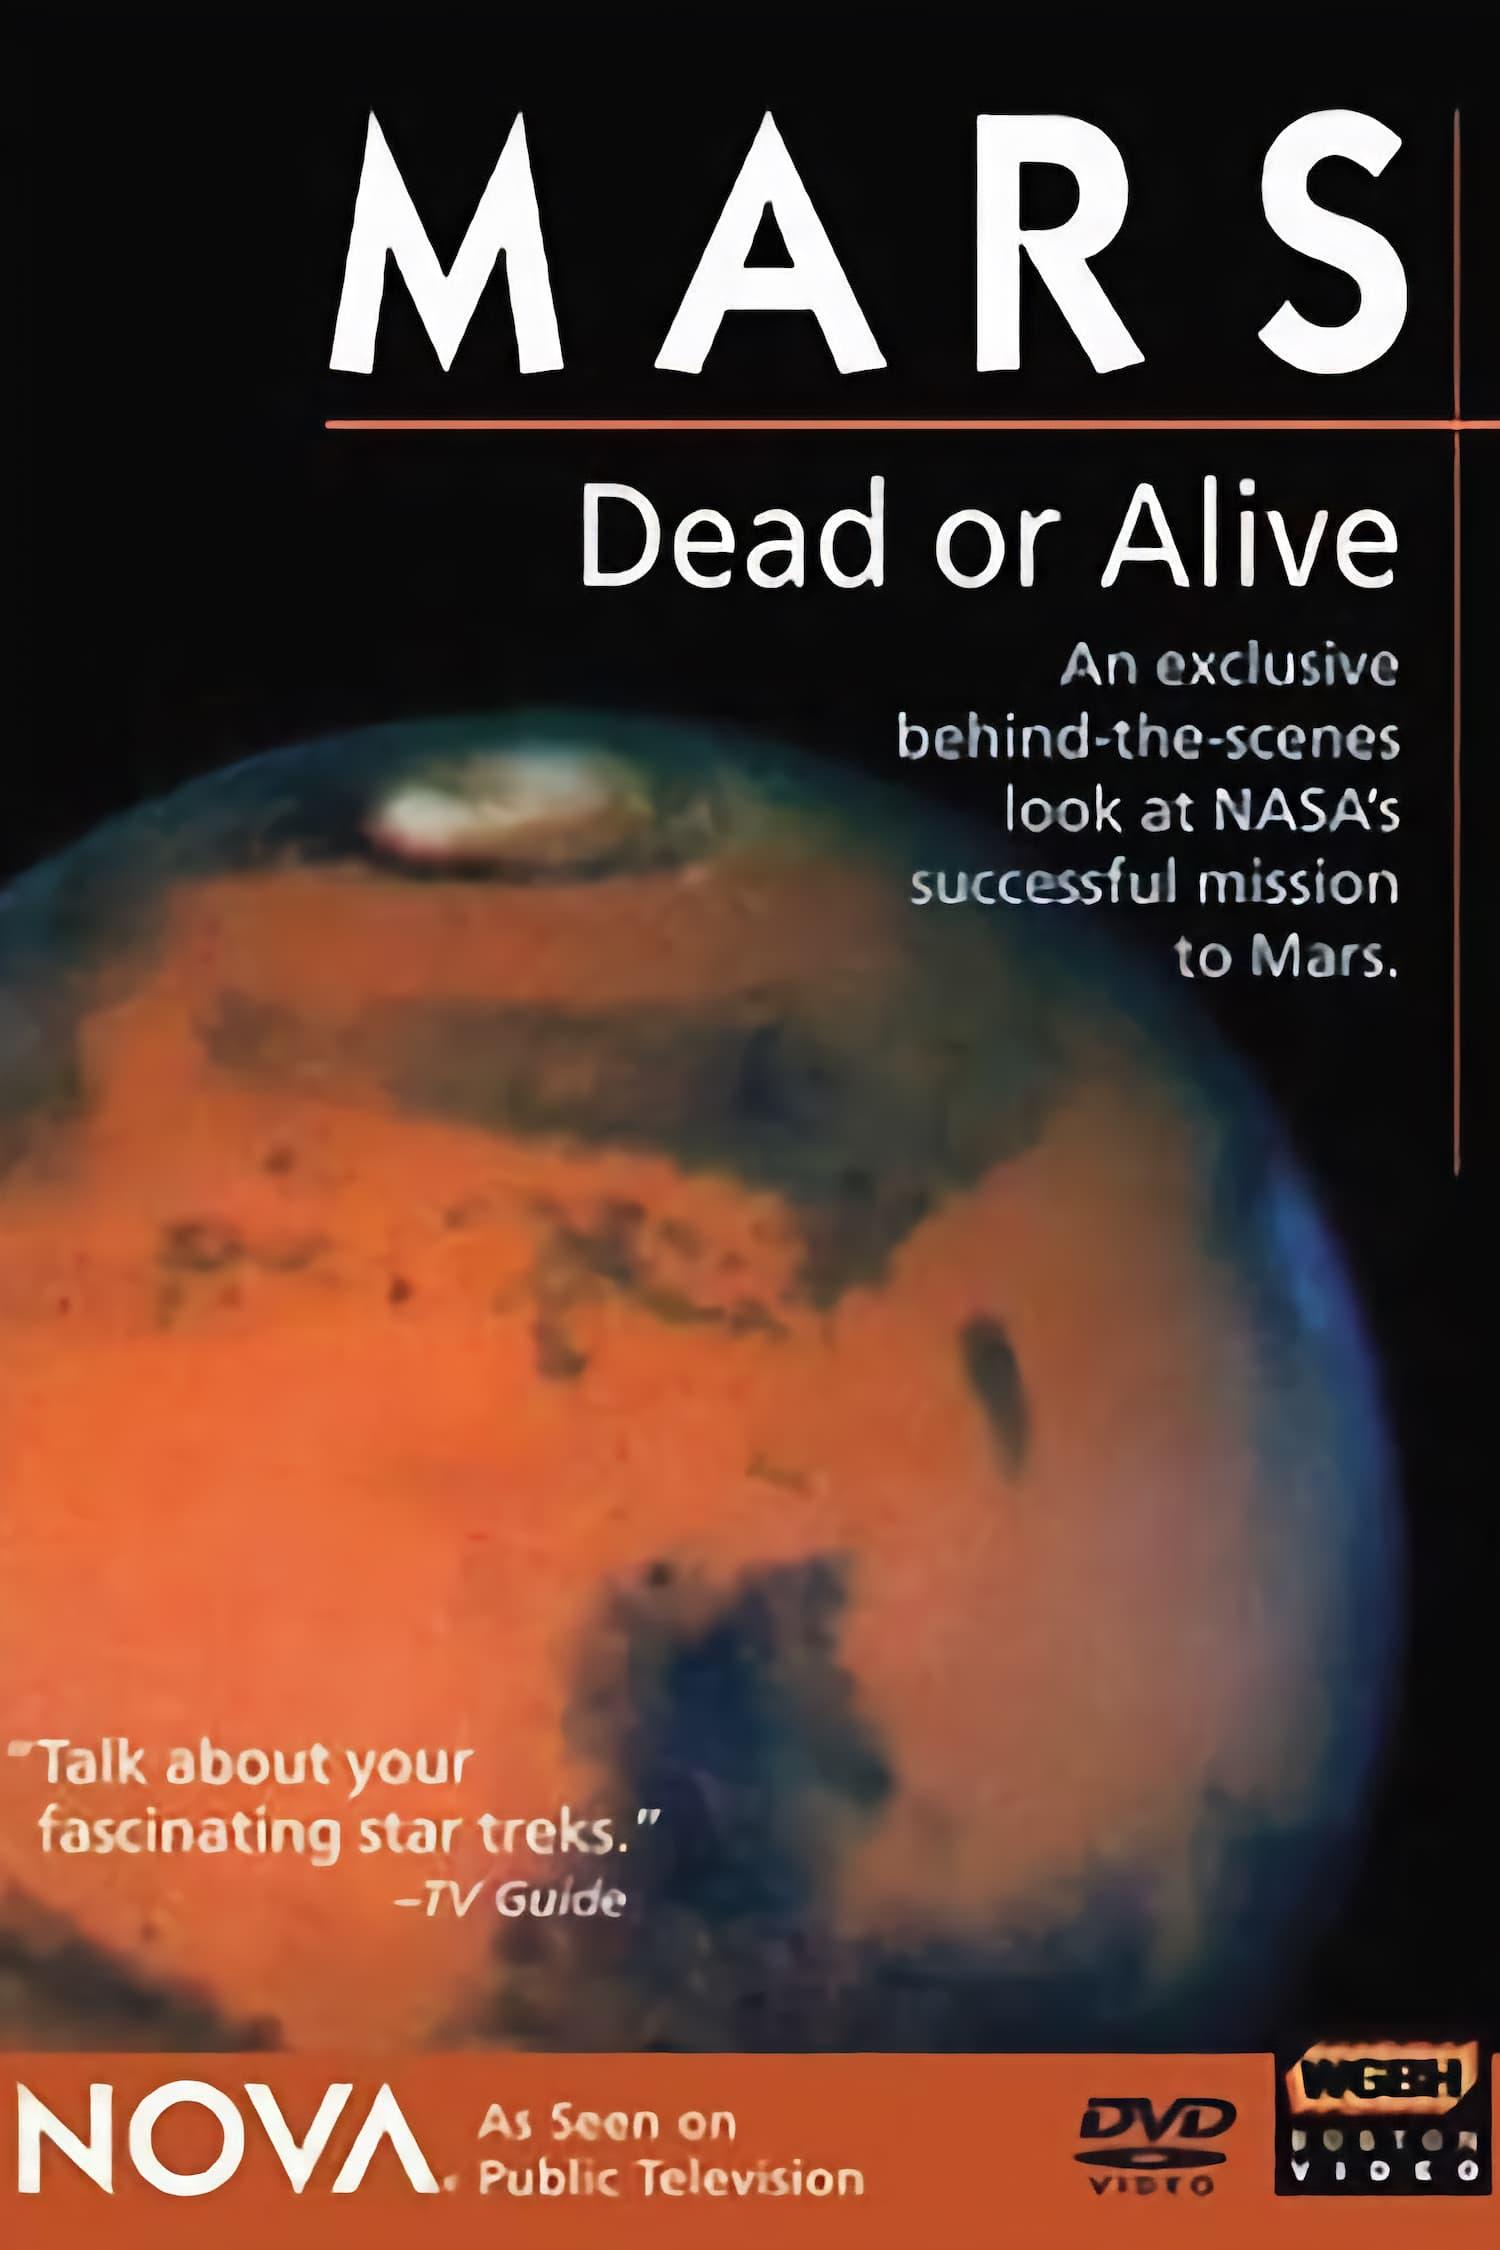 Mars, Dead or Alive